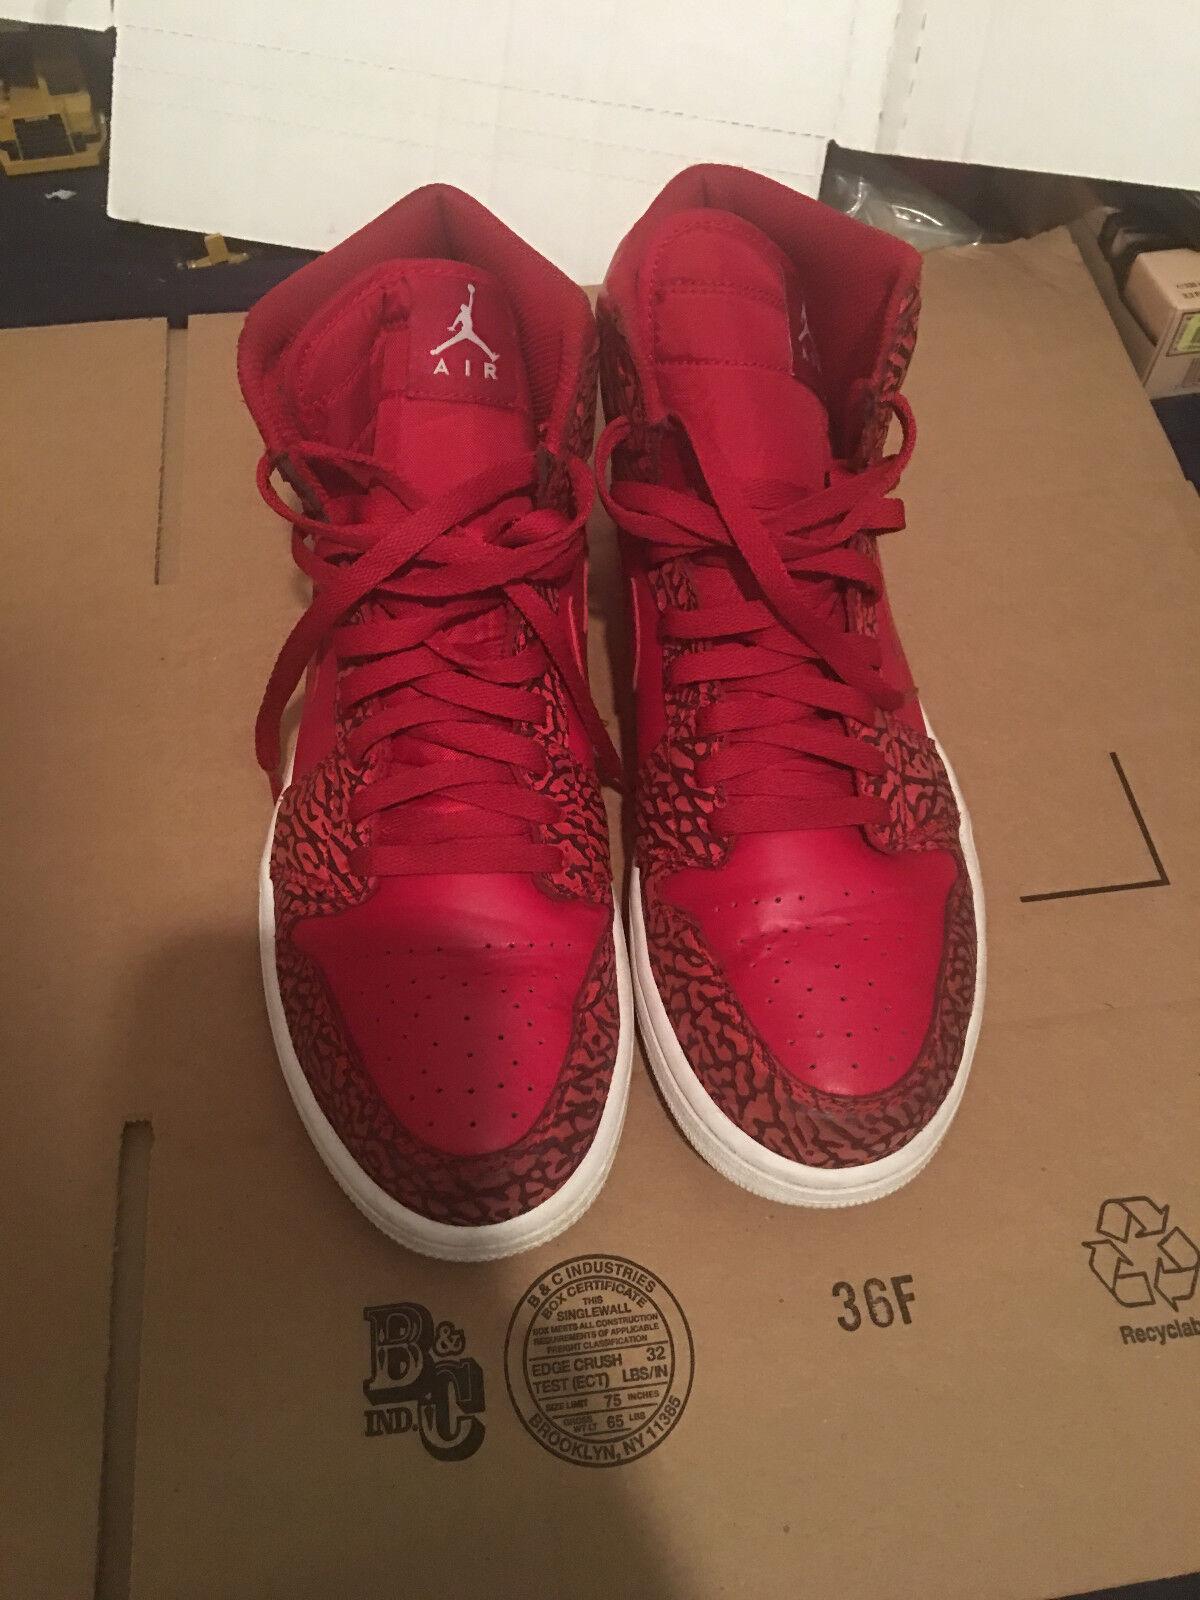 Nike Air Jordan 1 RETRO High UnSupreme Eelephant Men's Shoes, 839115 600 Sz 12